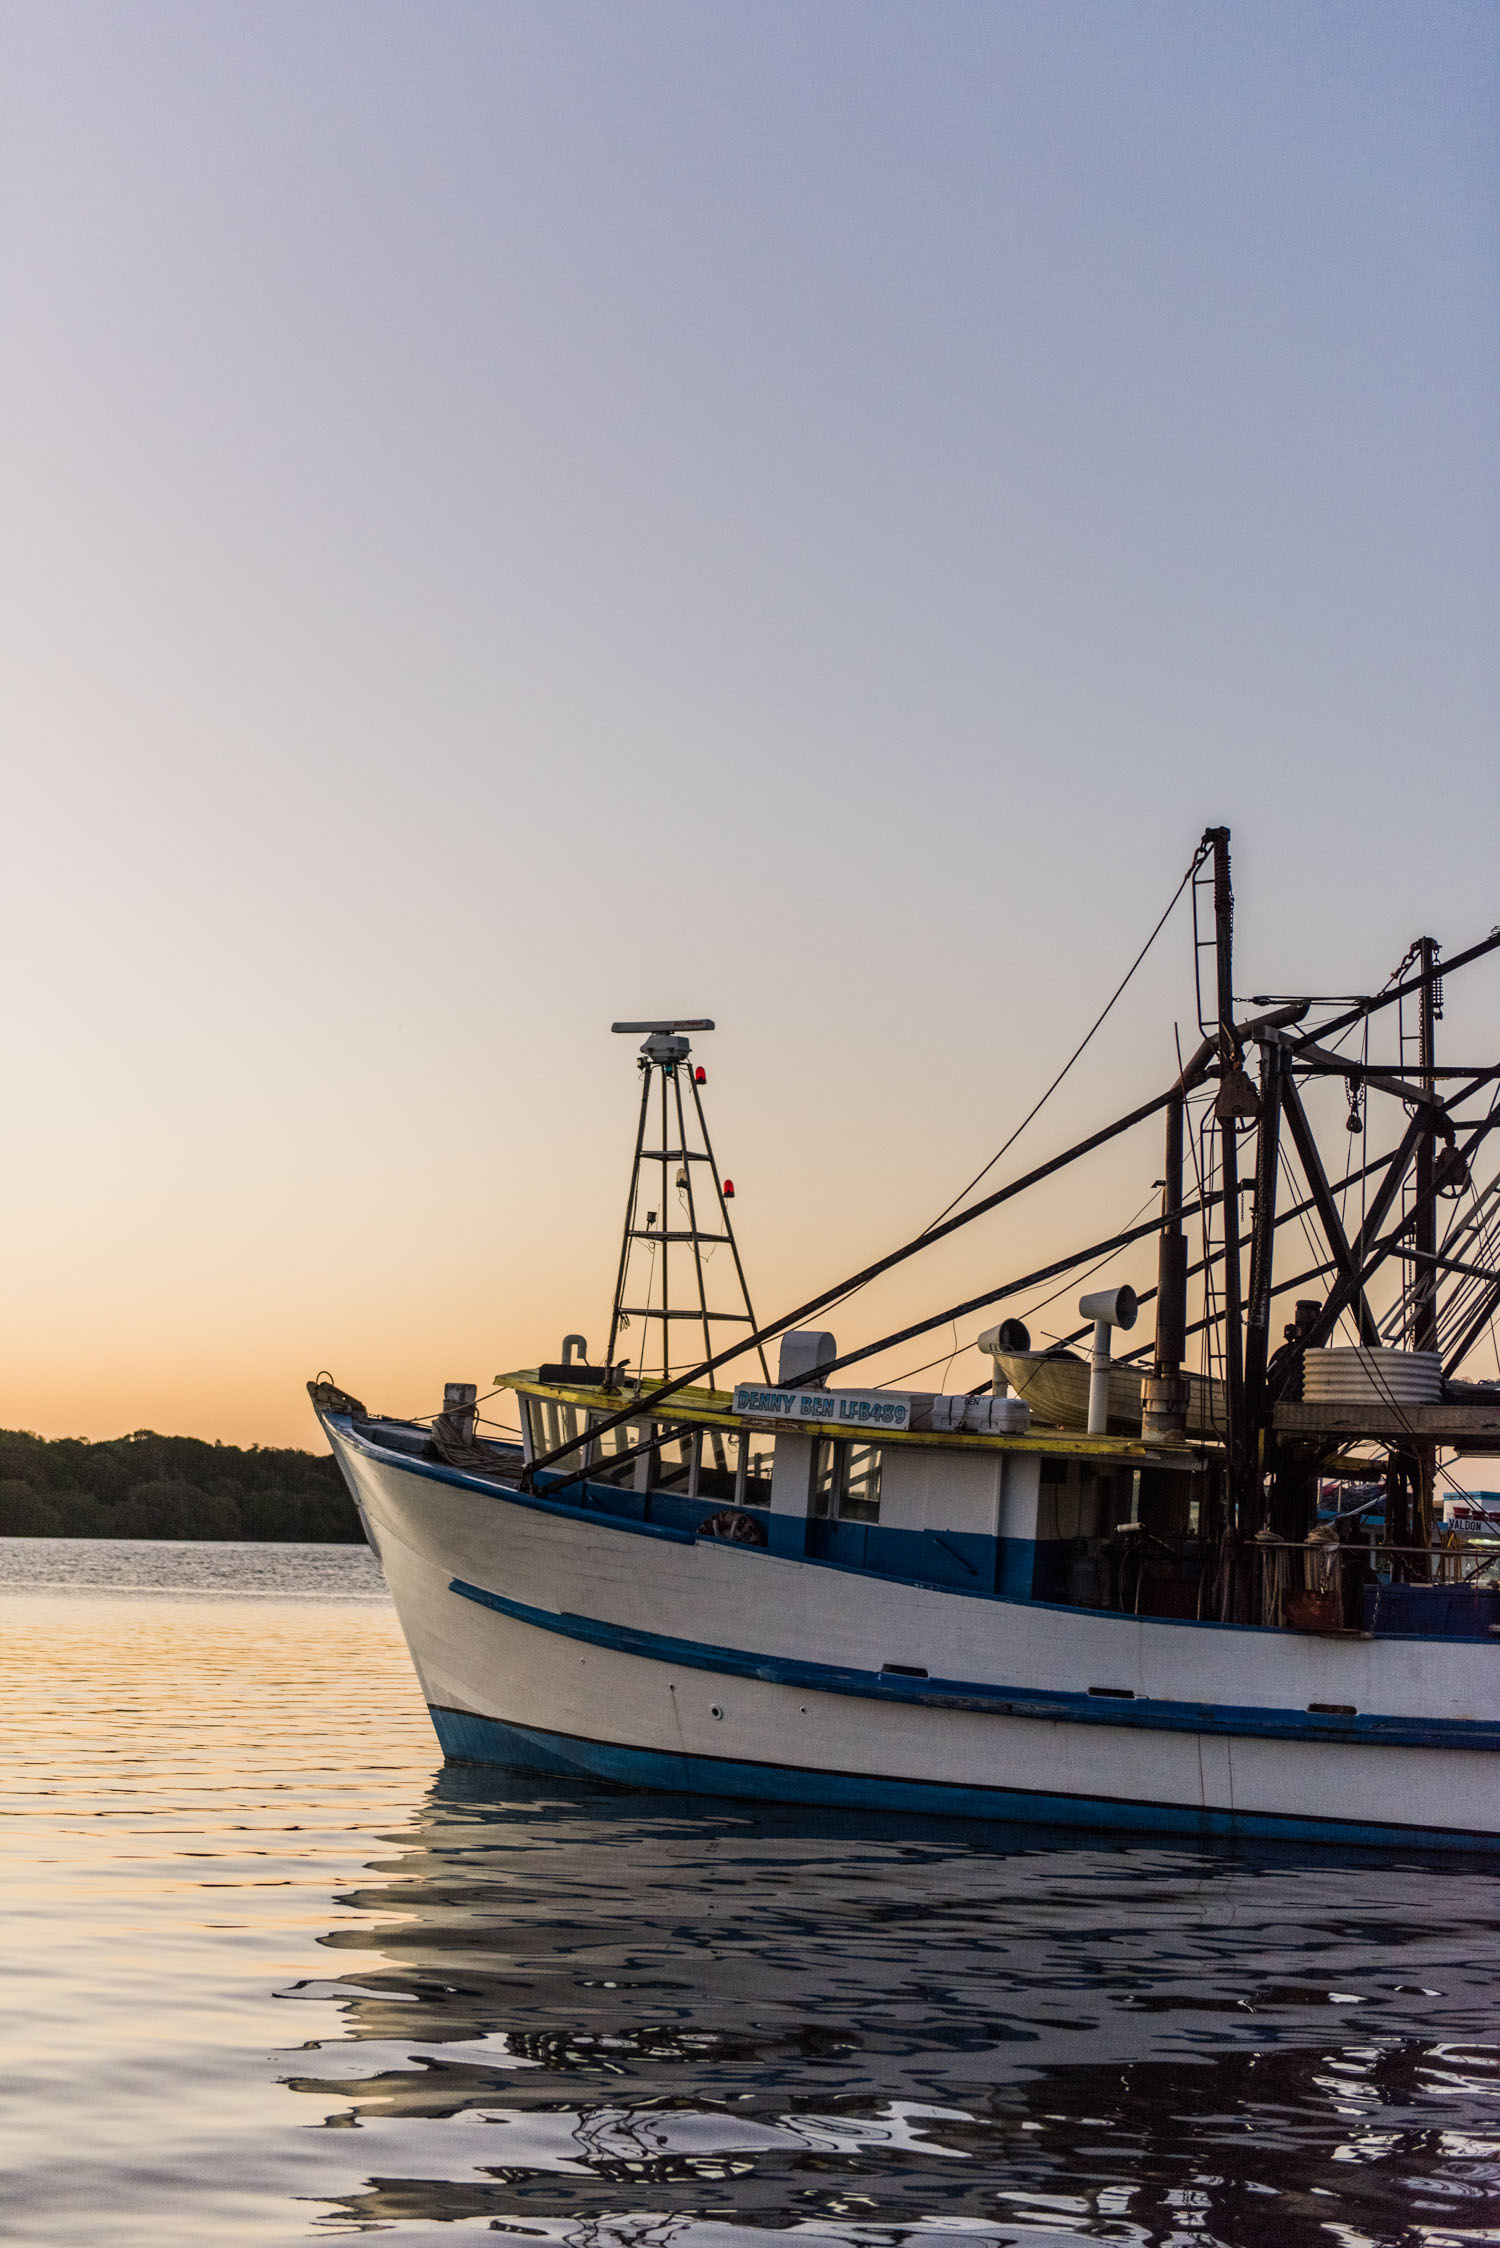 hannahpuechmarin-yamba marina-australiantravelphotographer-8.jpg